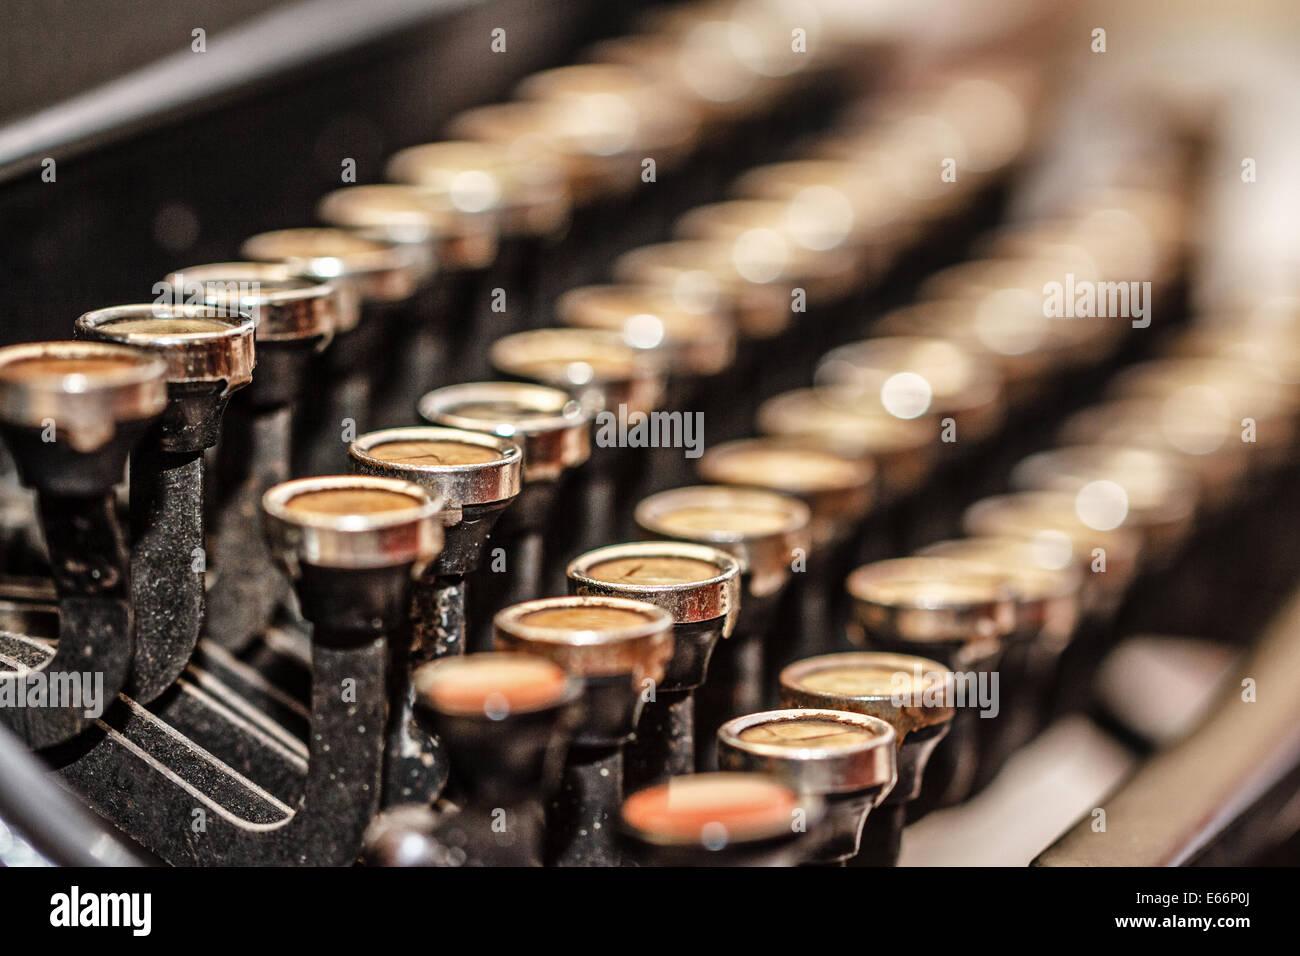 Retro Vintage Schreibmaschine Closeup erschossen Office supplies Stockbild